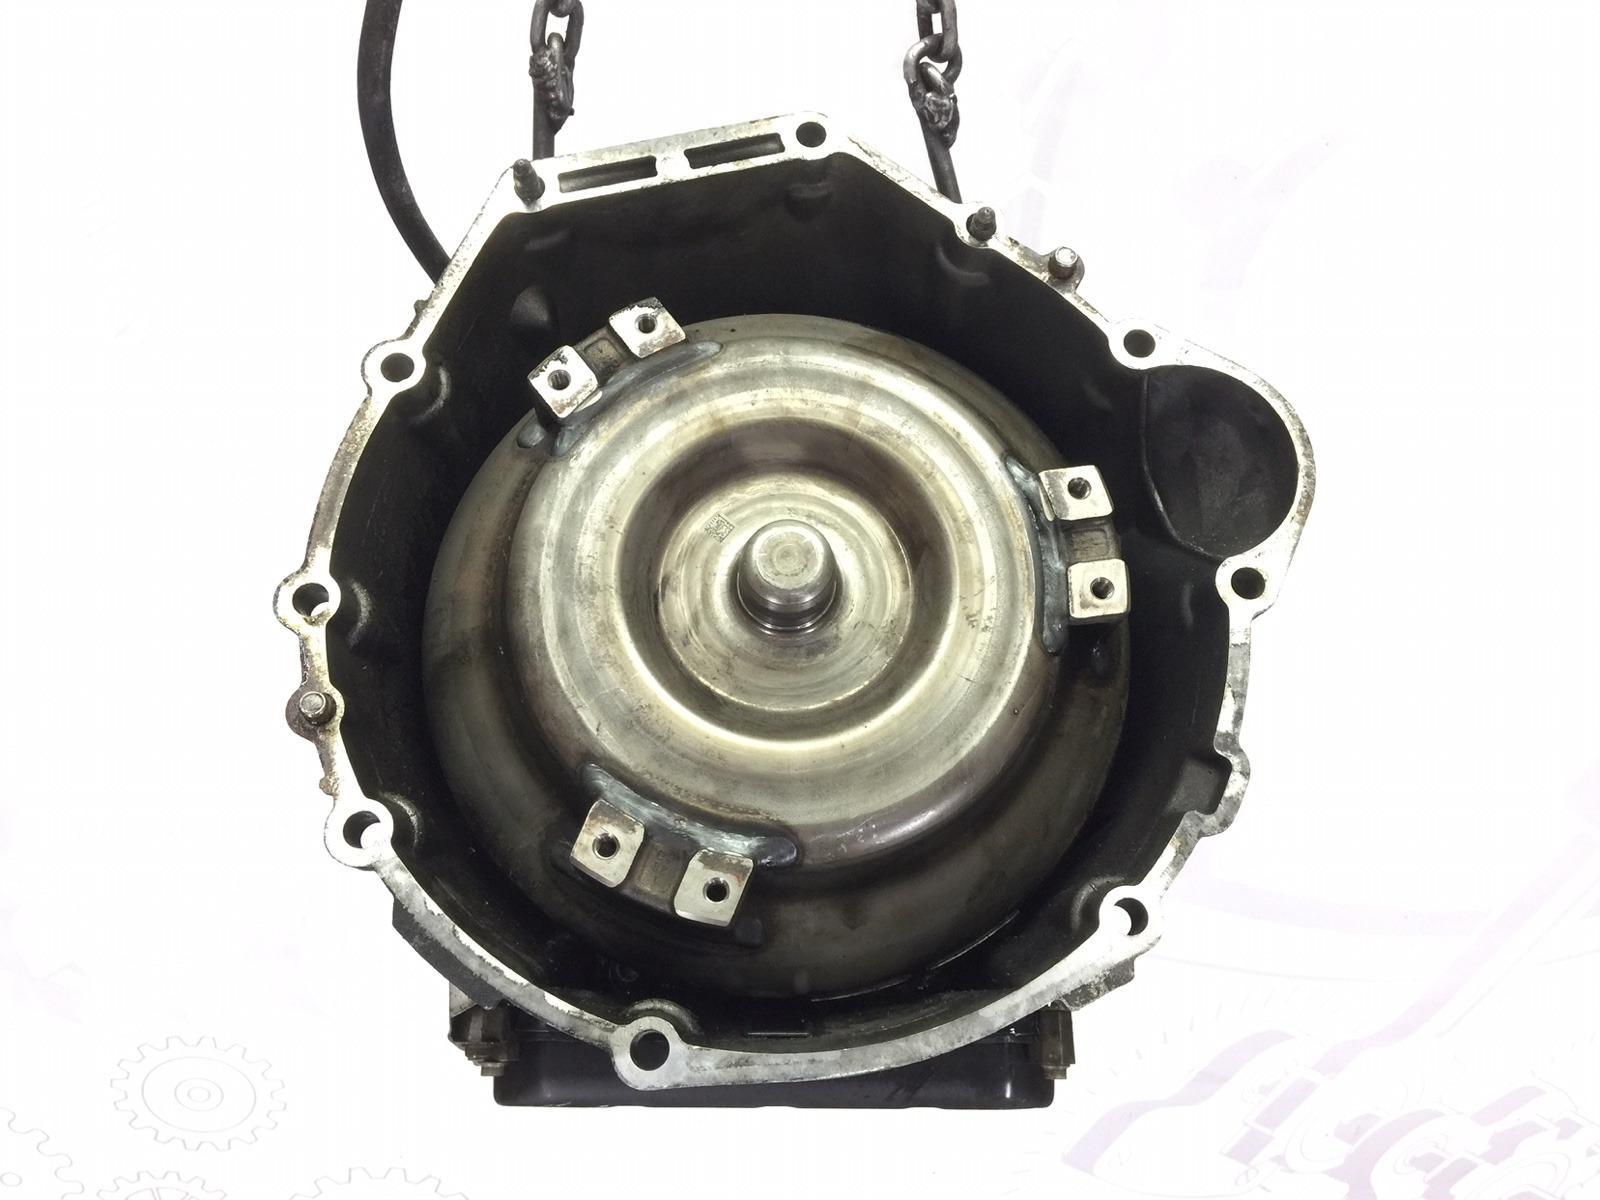 Кпп автоматическая (акпп) Ssangyong Rexton 2.7 CRDI 2005 (б/у)